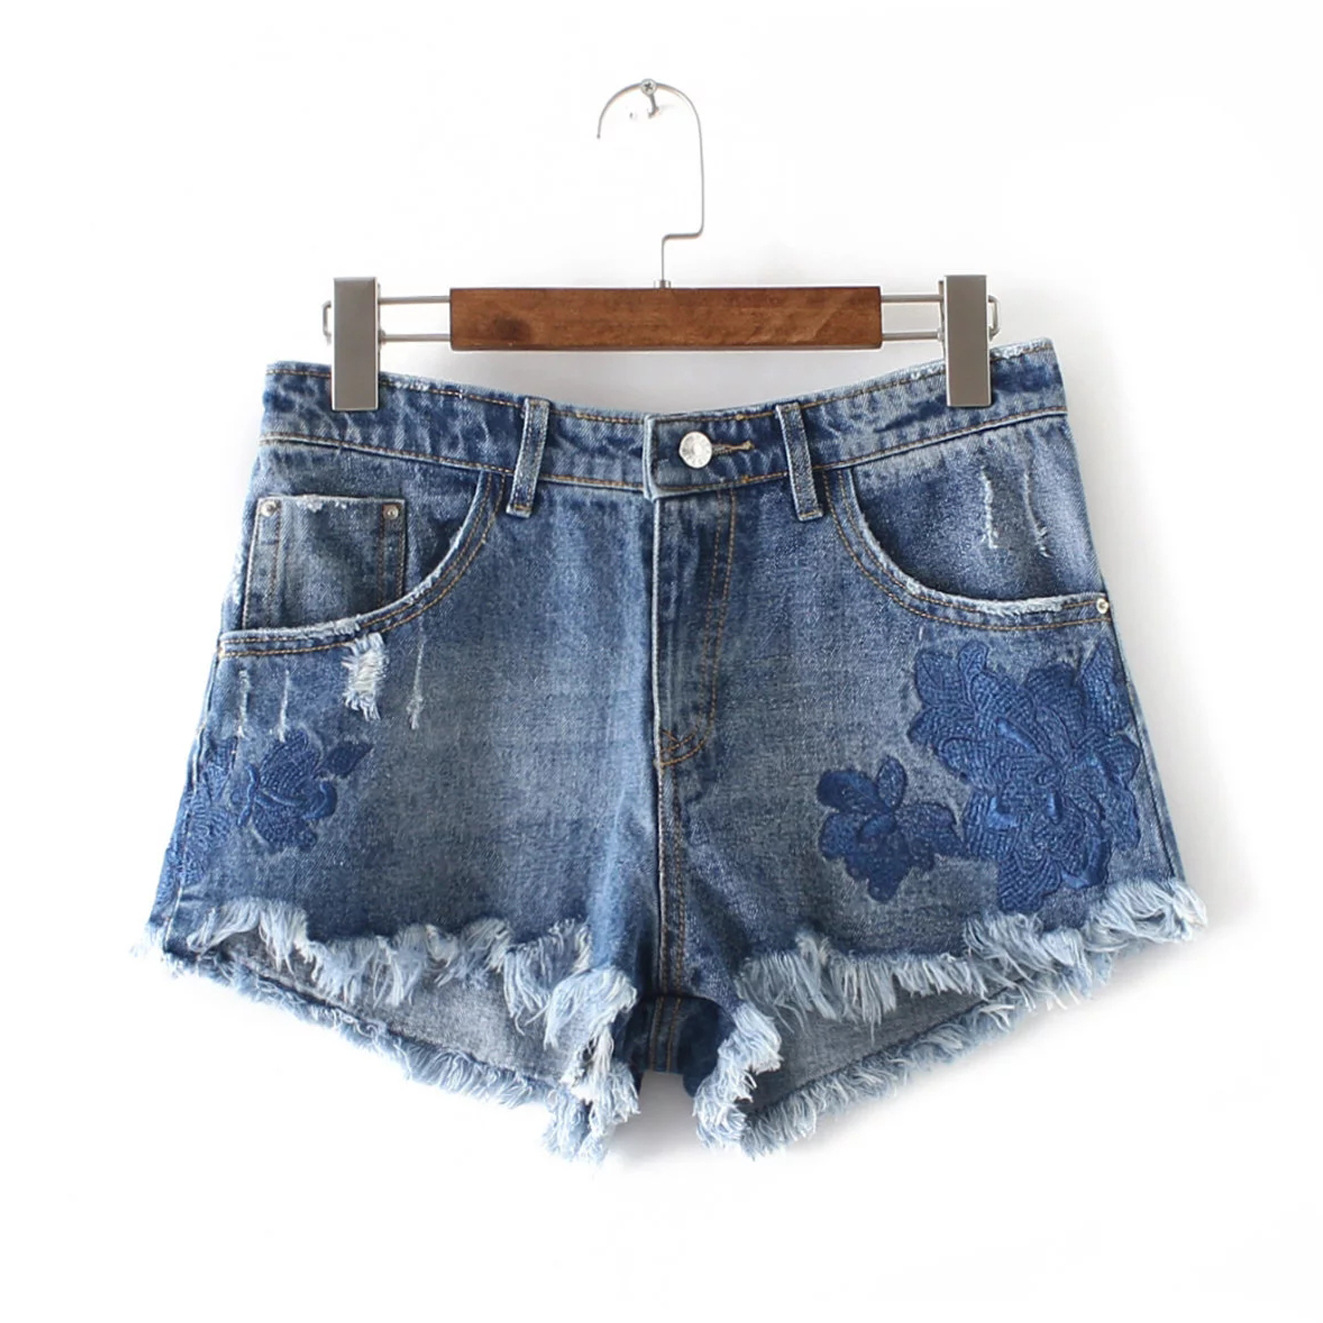 New Womens wear irregular edges embroidered Jean Shorts girl s fashion denim shorts on sale